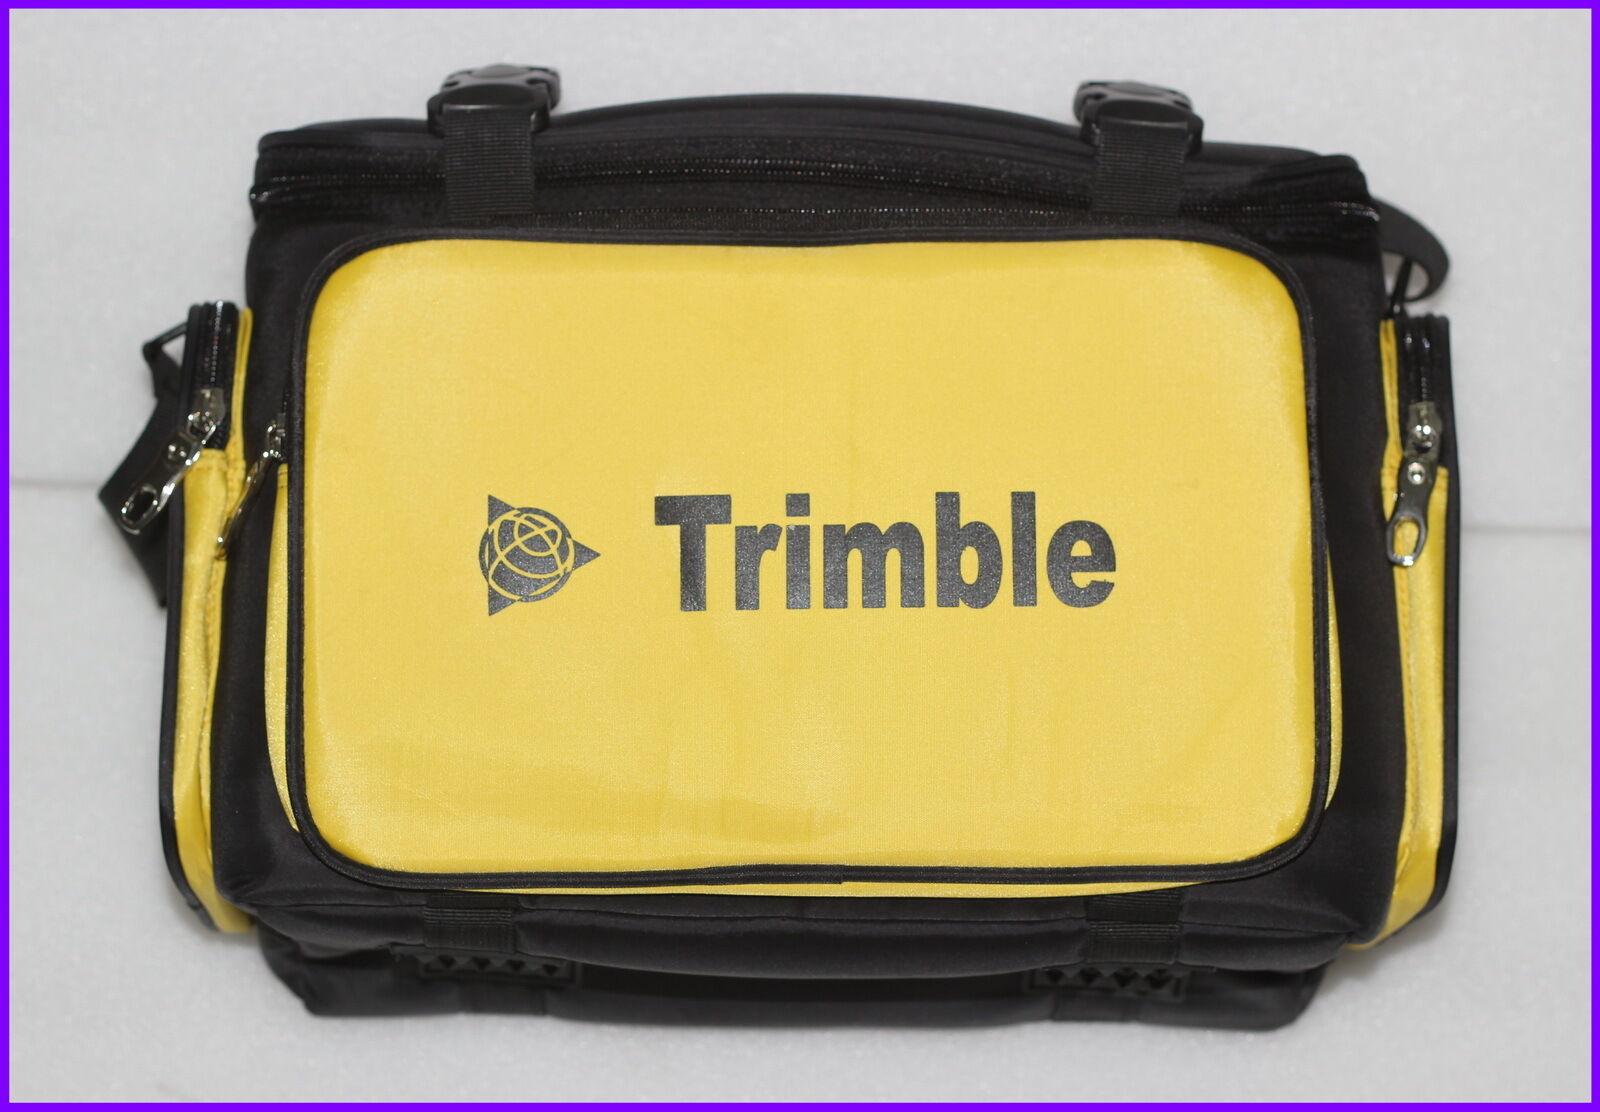 New Trimble GPS host bag Single shoulder bag for  Topcon Sokkia GPS Surveying